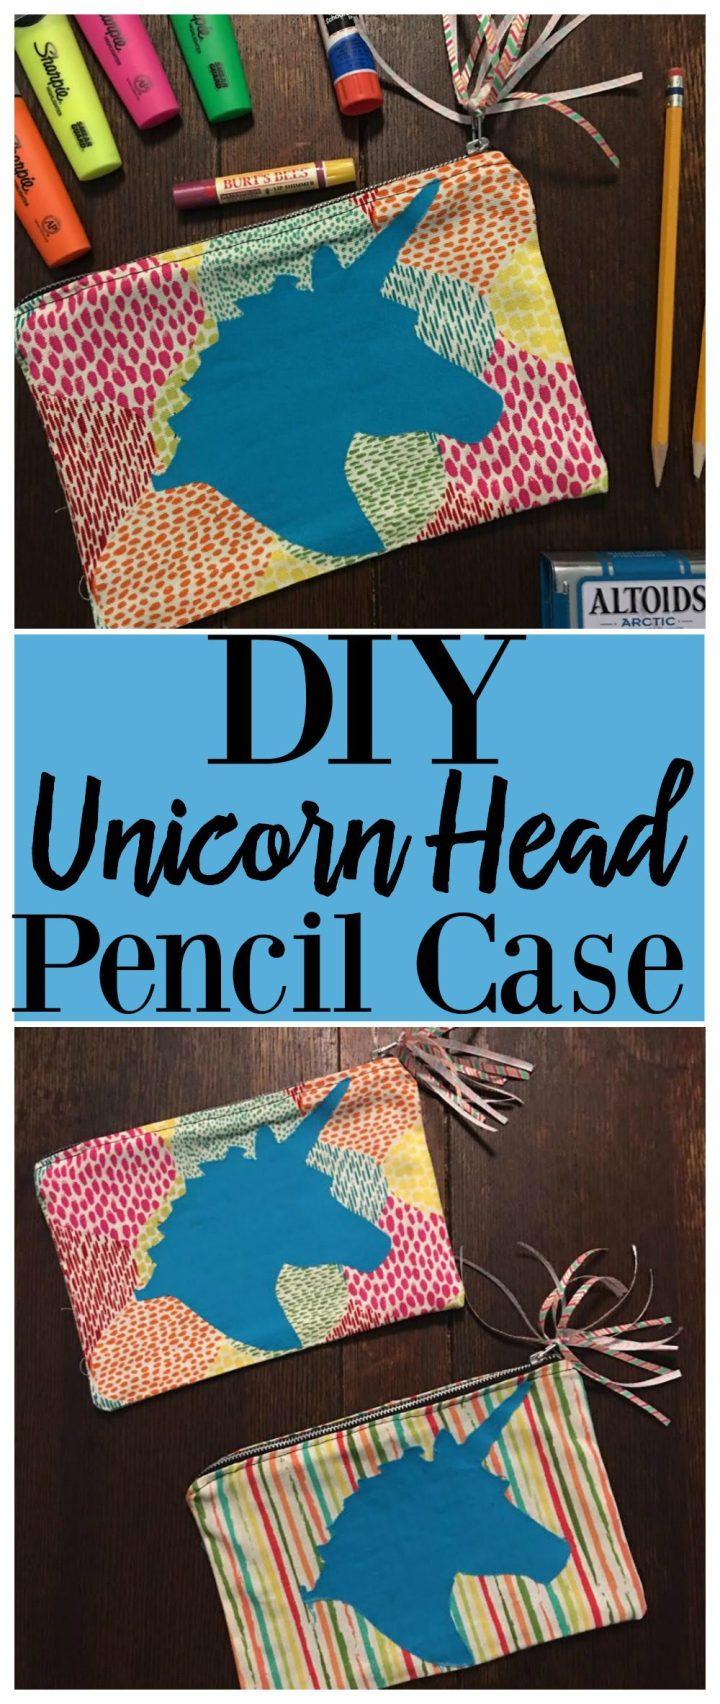 DIY Unicorn Pencil Case Waverly Inspirations